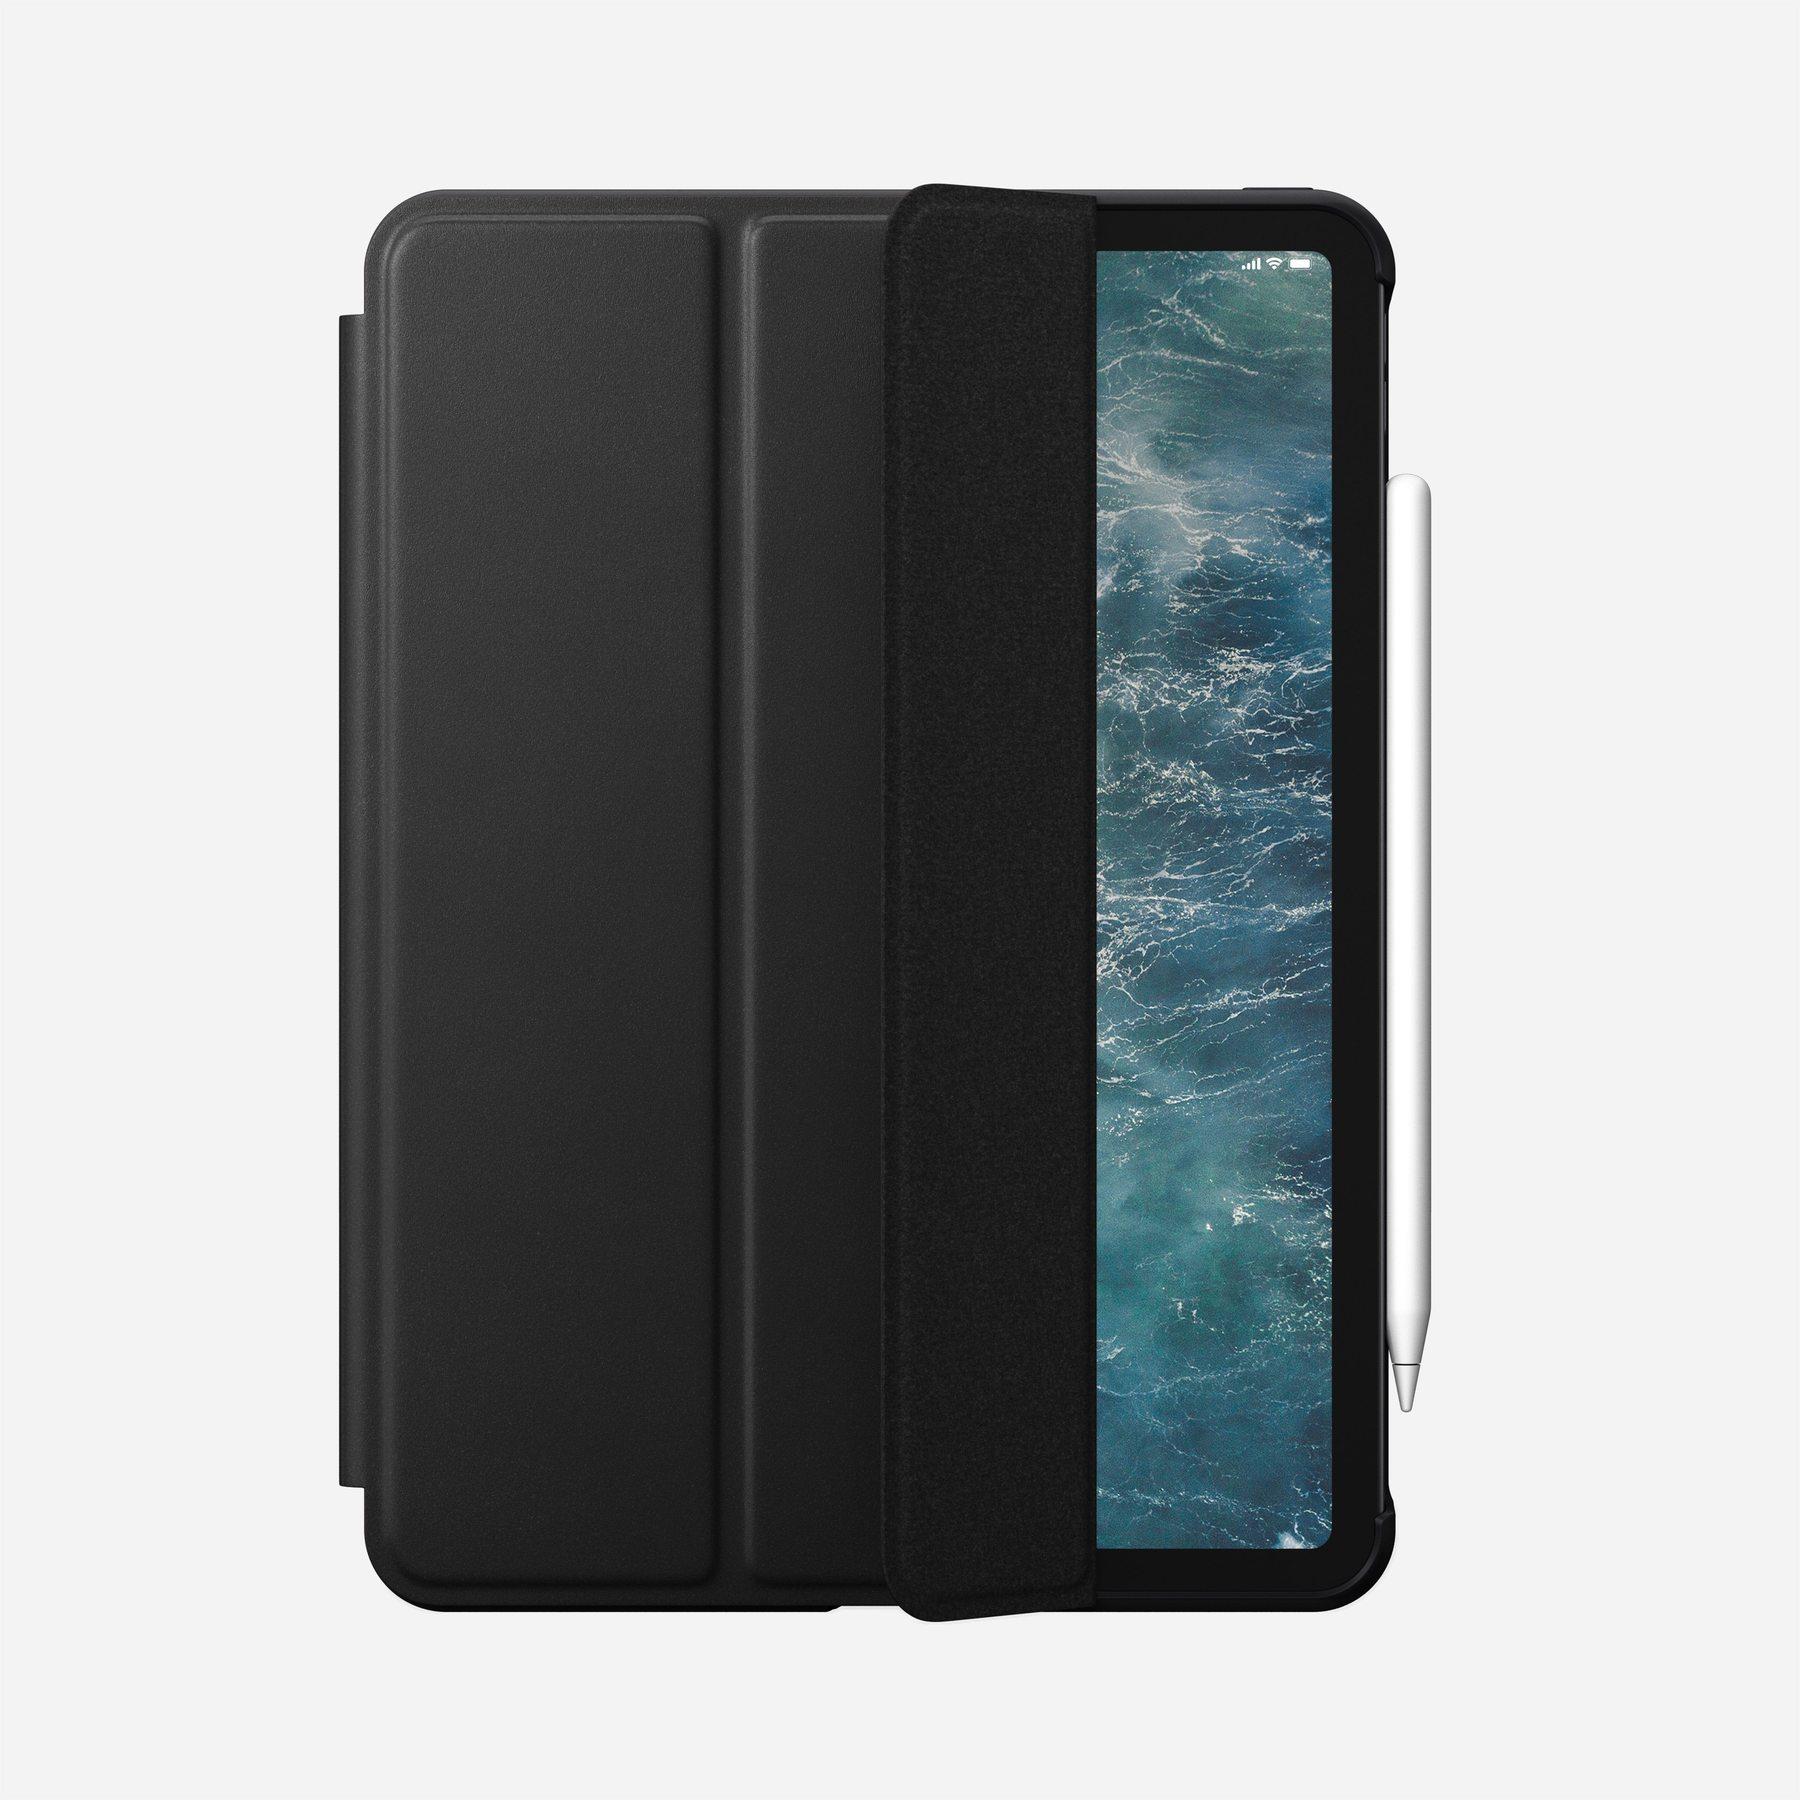 "Nomad Rugged Leather Folio Case für iPad Pro 11"" Black"